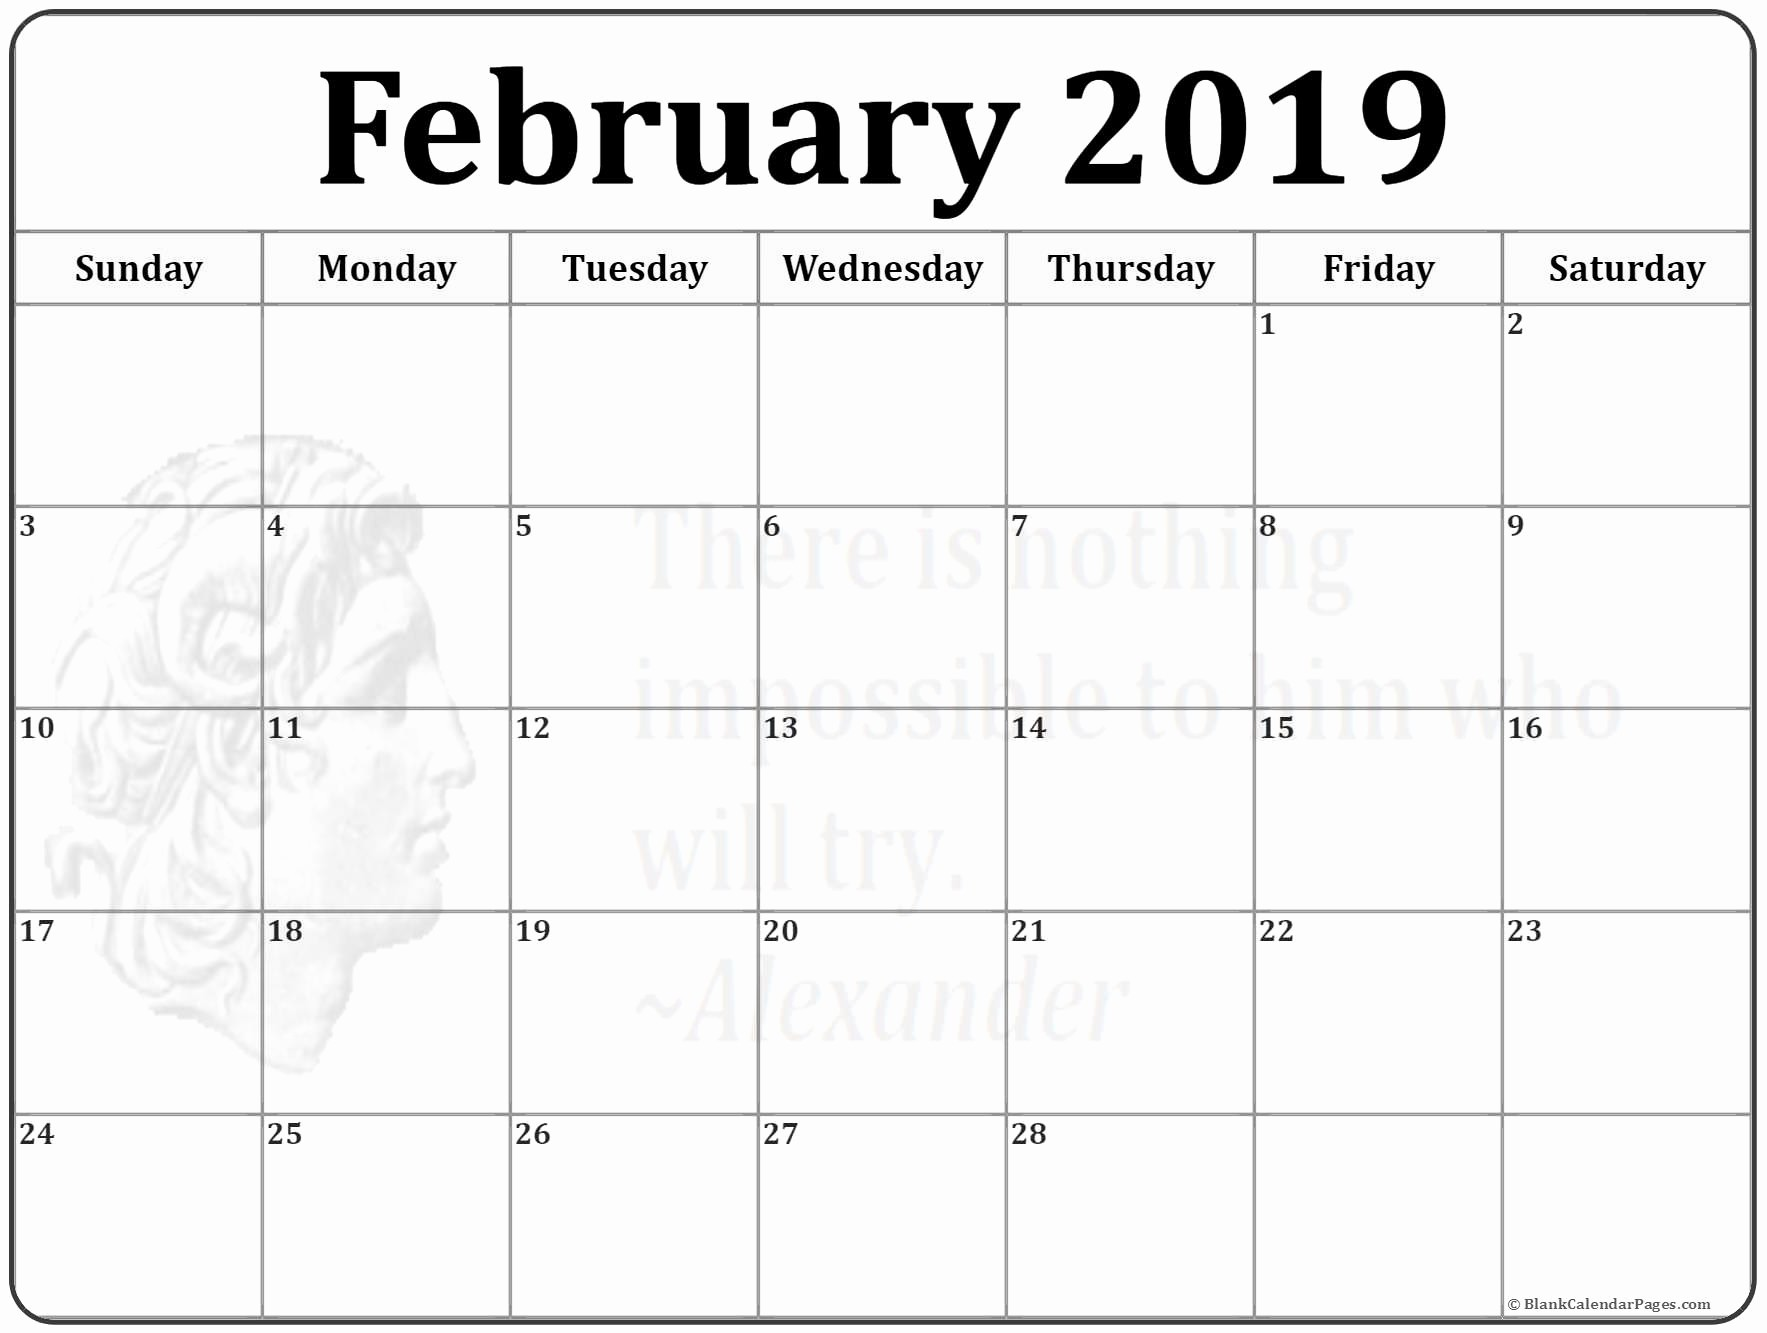 Free Printable Weekly Calendar 2019 Luxury February 2019 Calendar